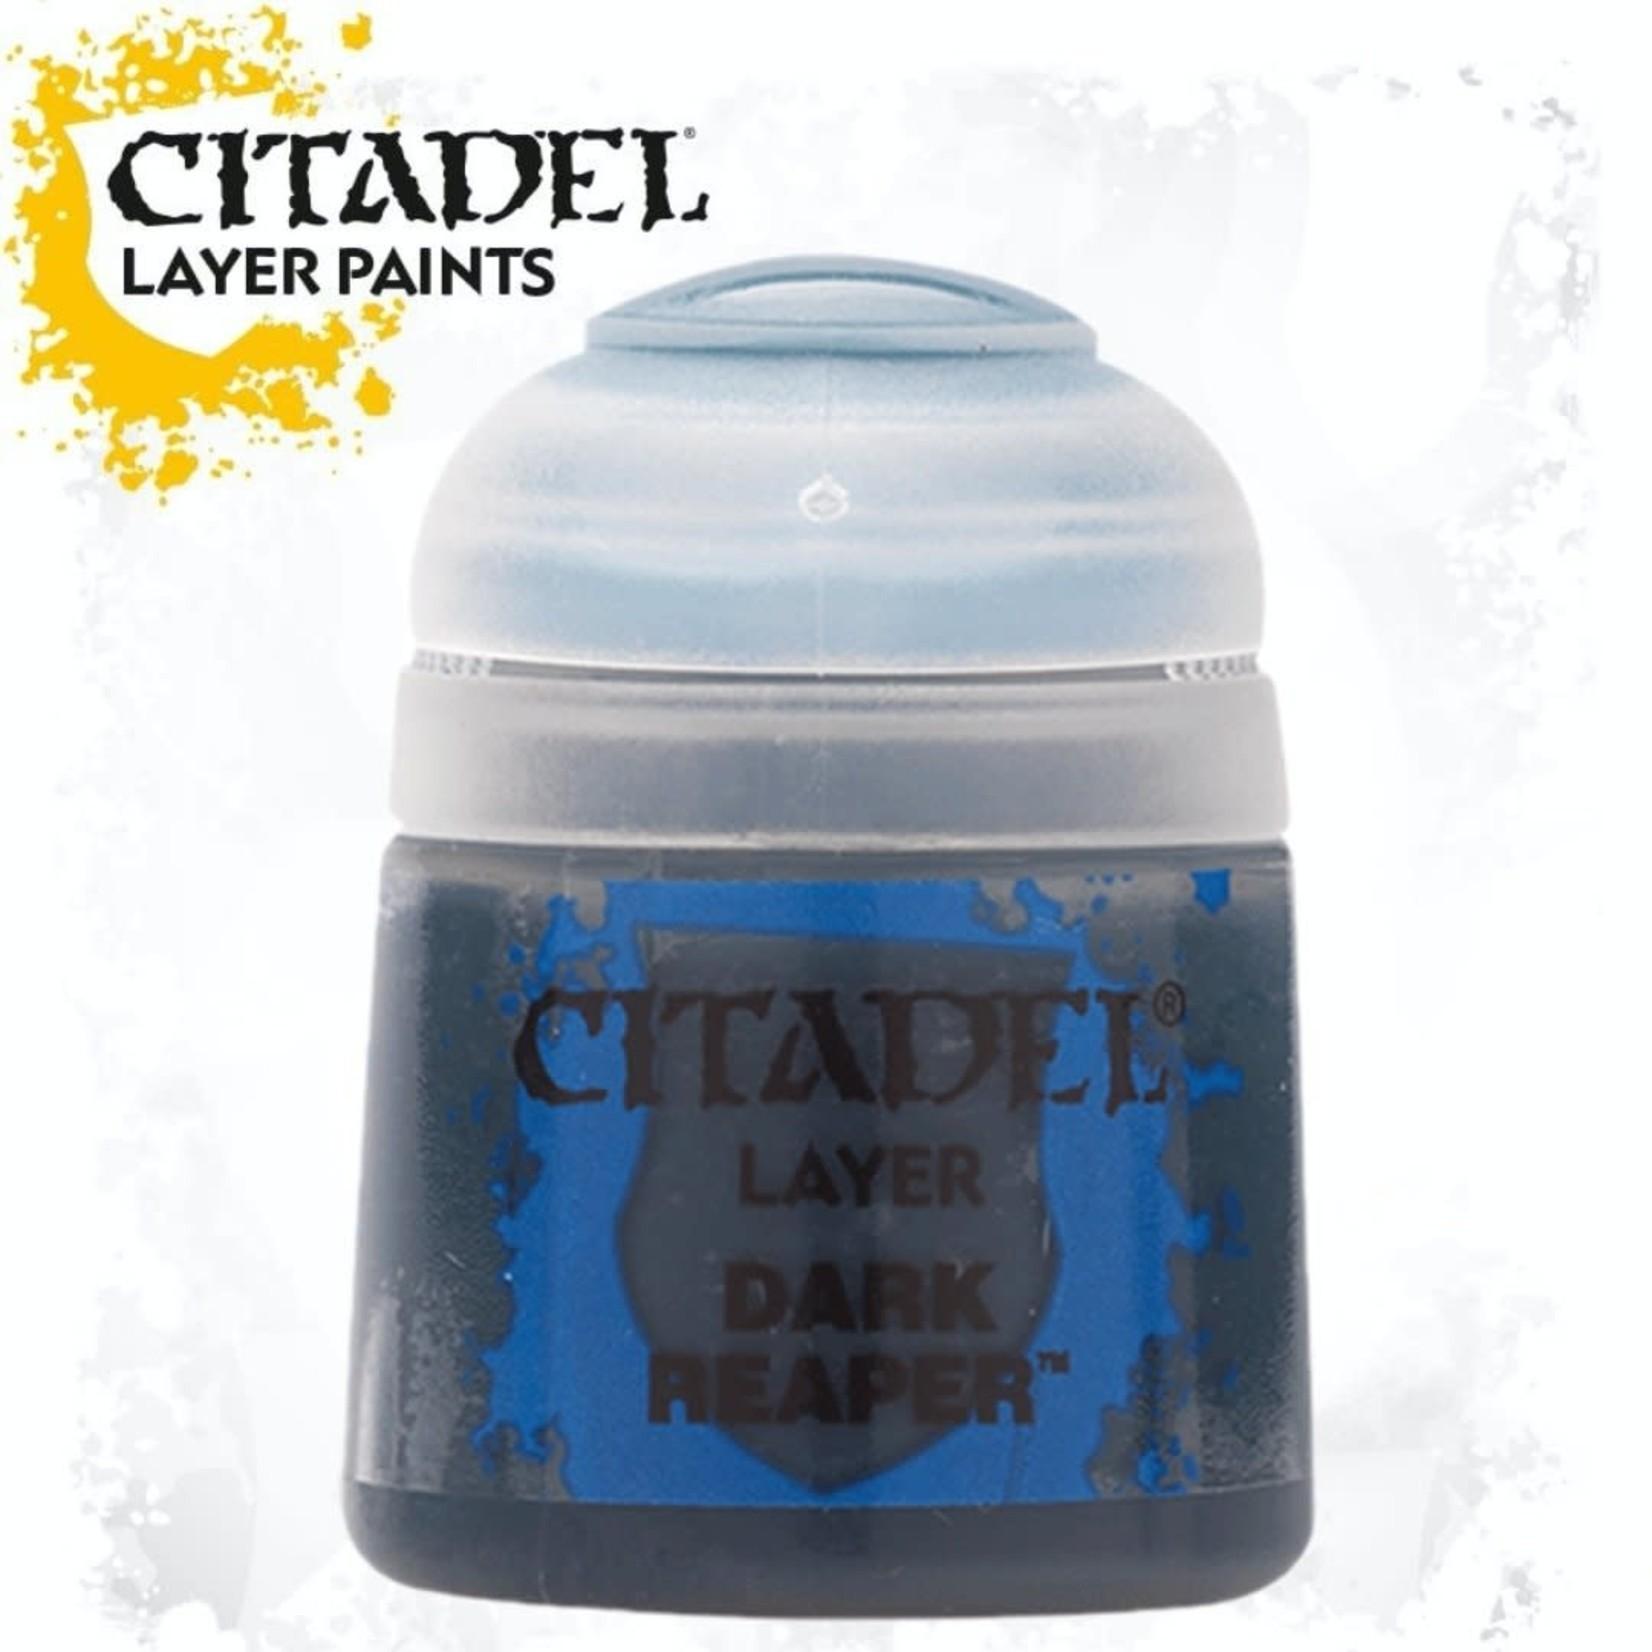 Citadel Citadel Paint - Layer: Dark Reaper